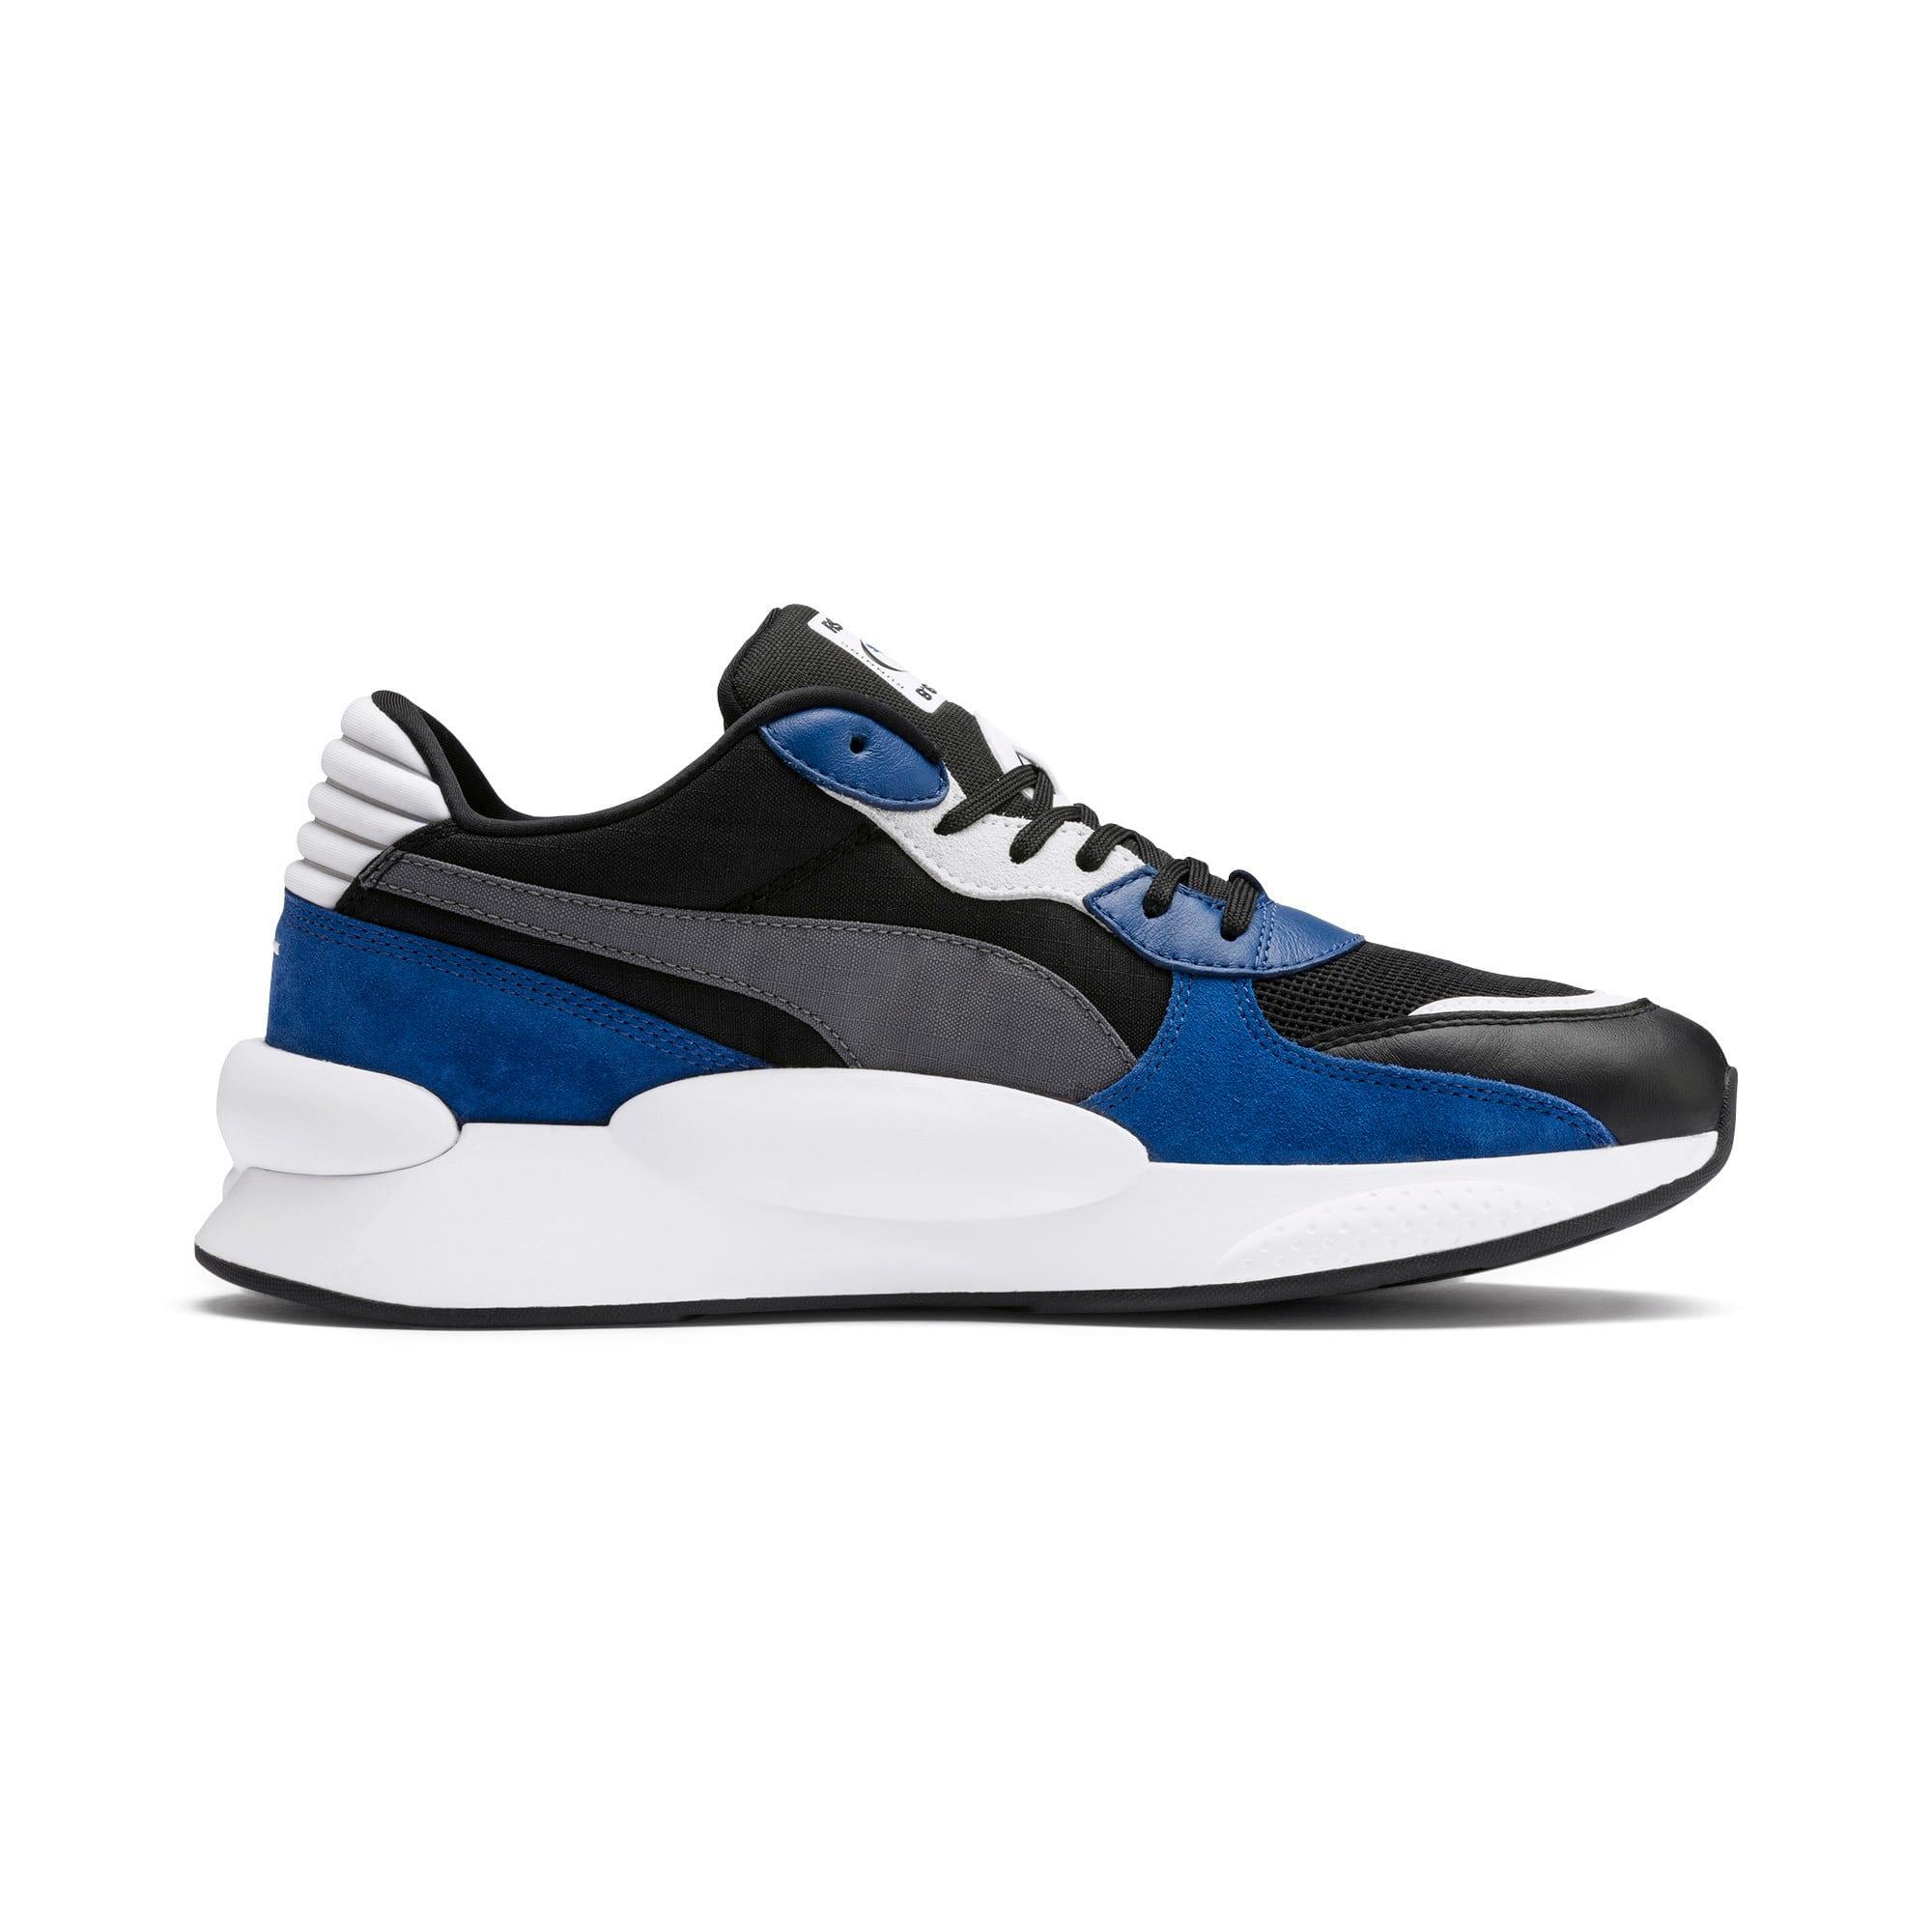 Thumbnail 5 of RS 9.8 Space Sneakers, Puma Black-Galaxy Blue, medium